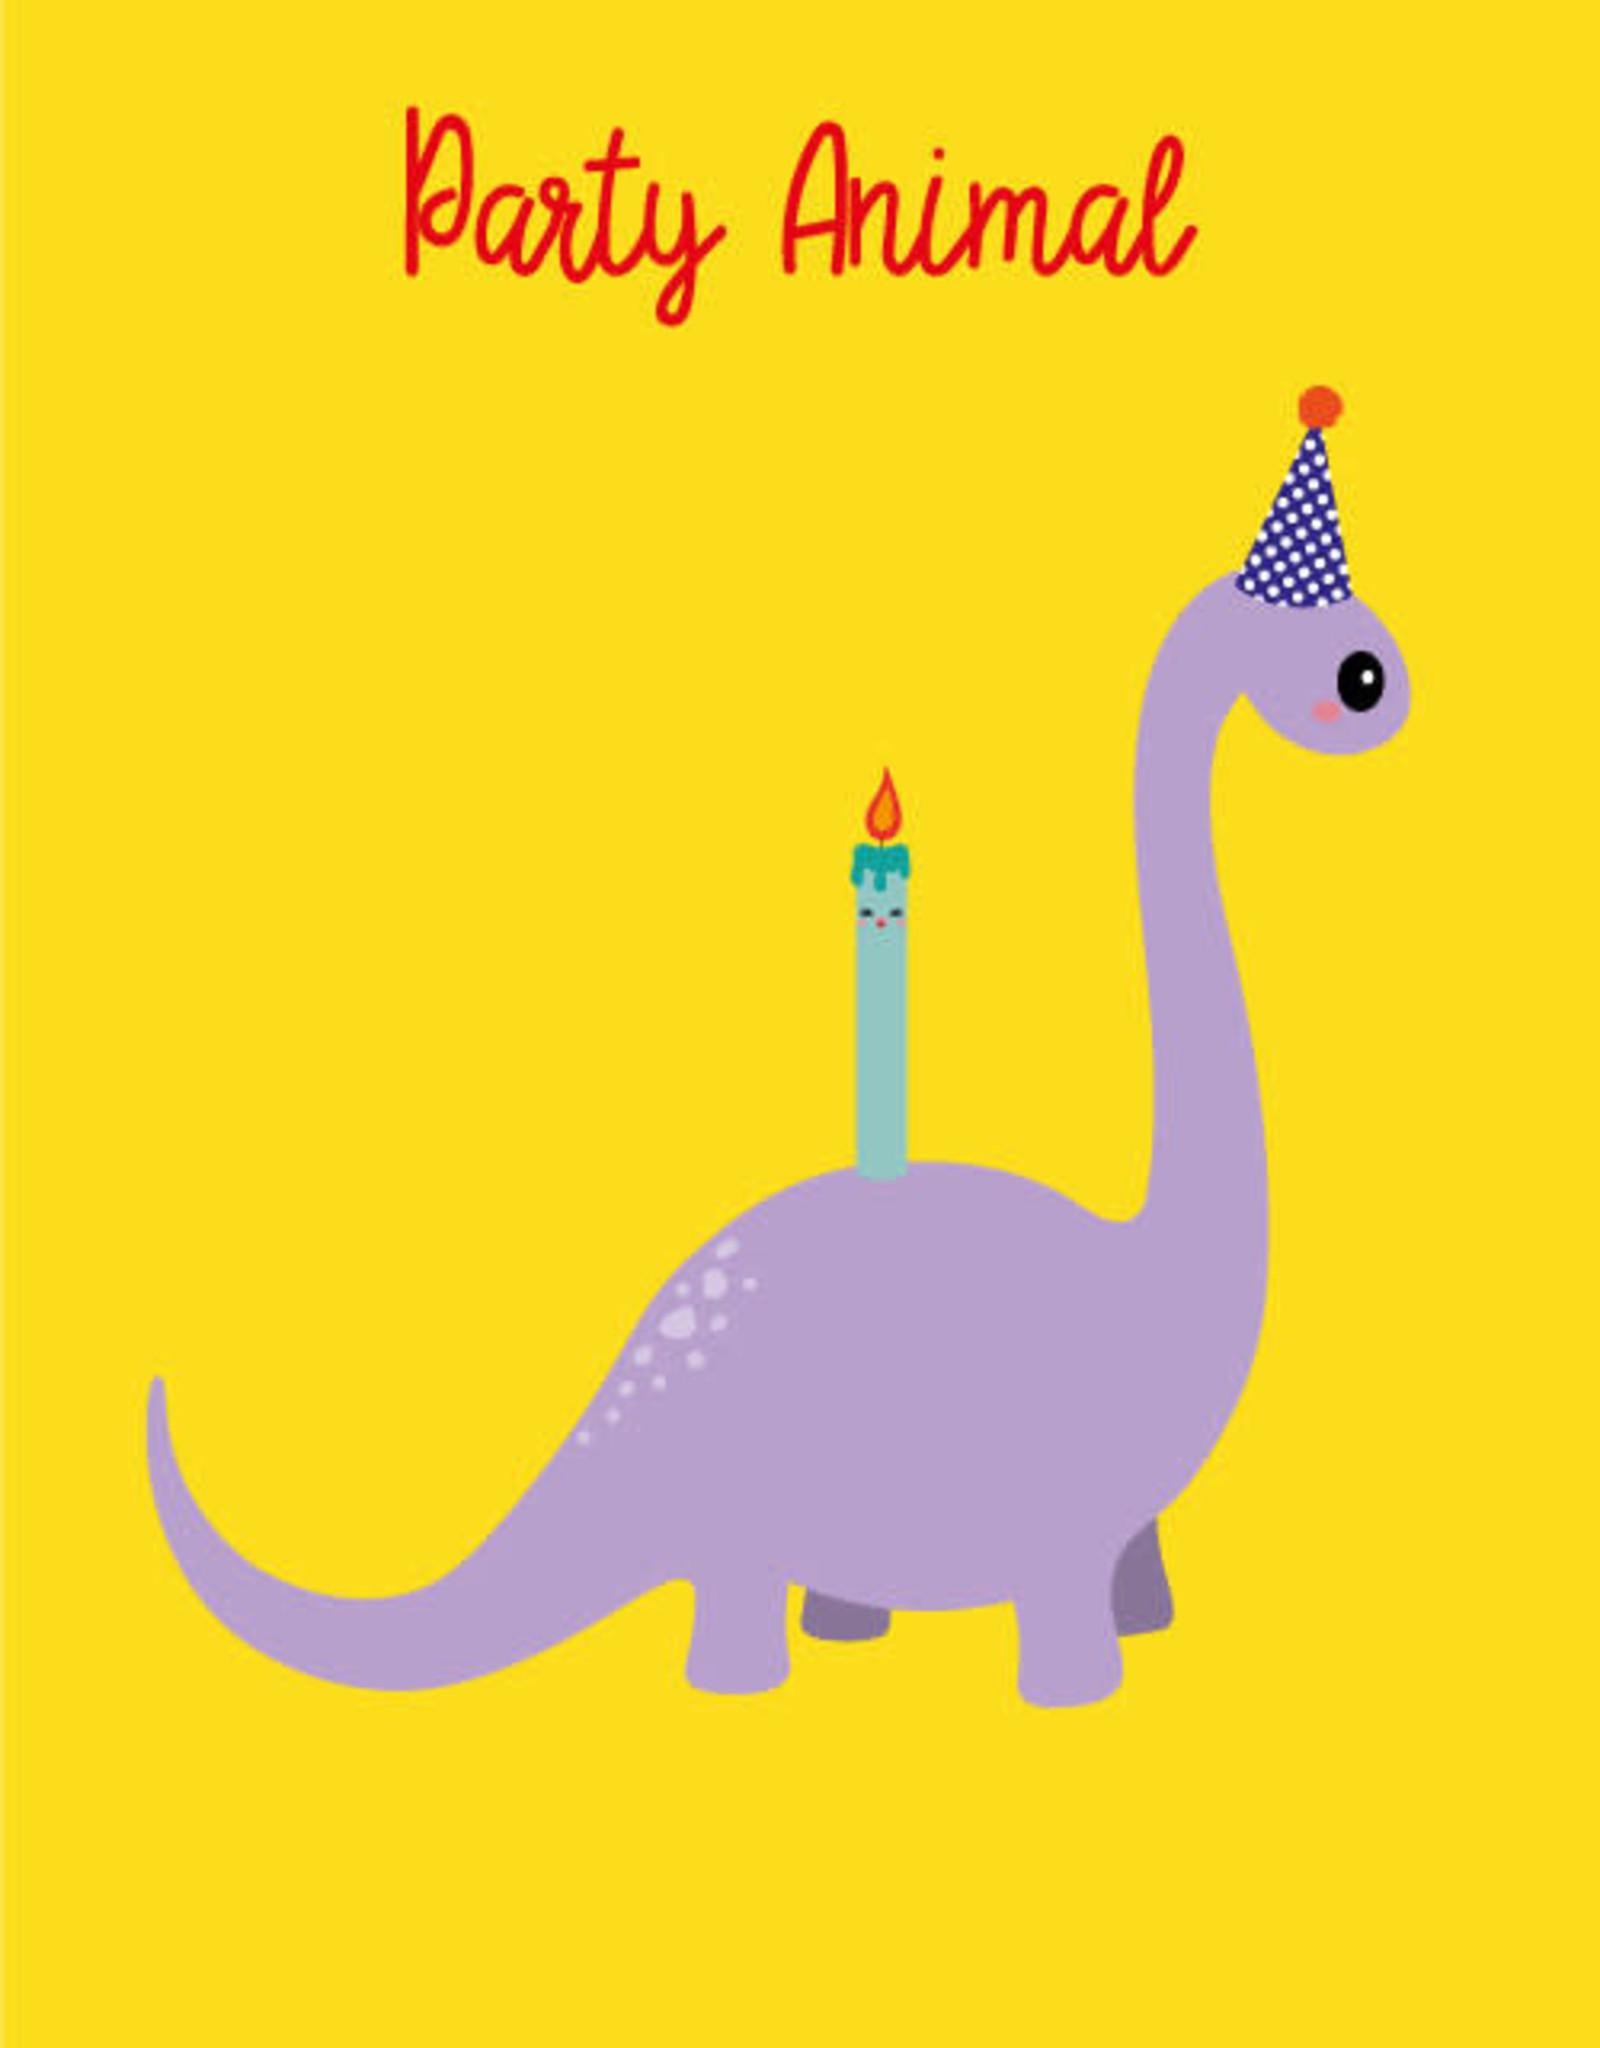 studio inktvis kaart a6 studio inktvis: party animal